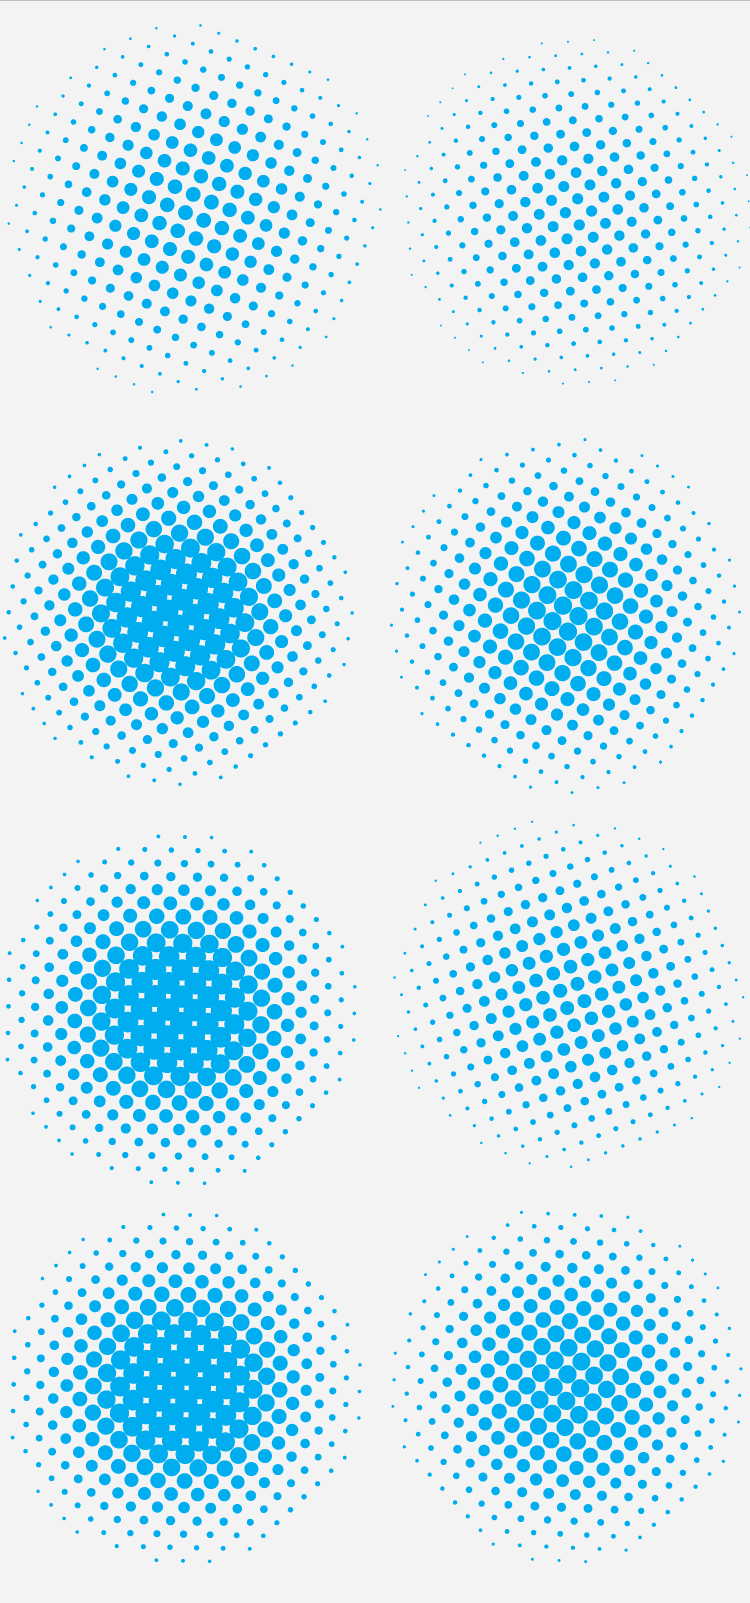 halftone abstract vectors Halftone abstract vectors